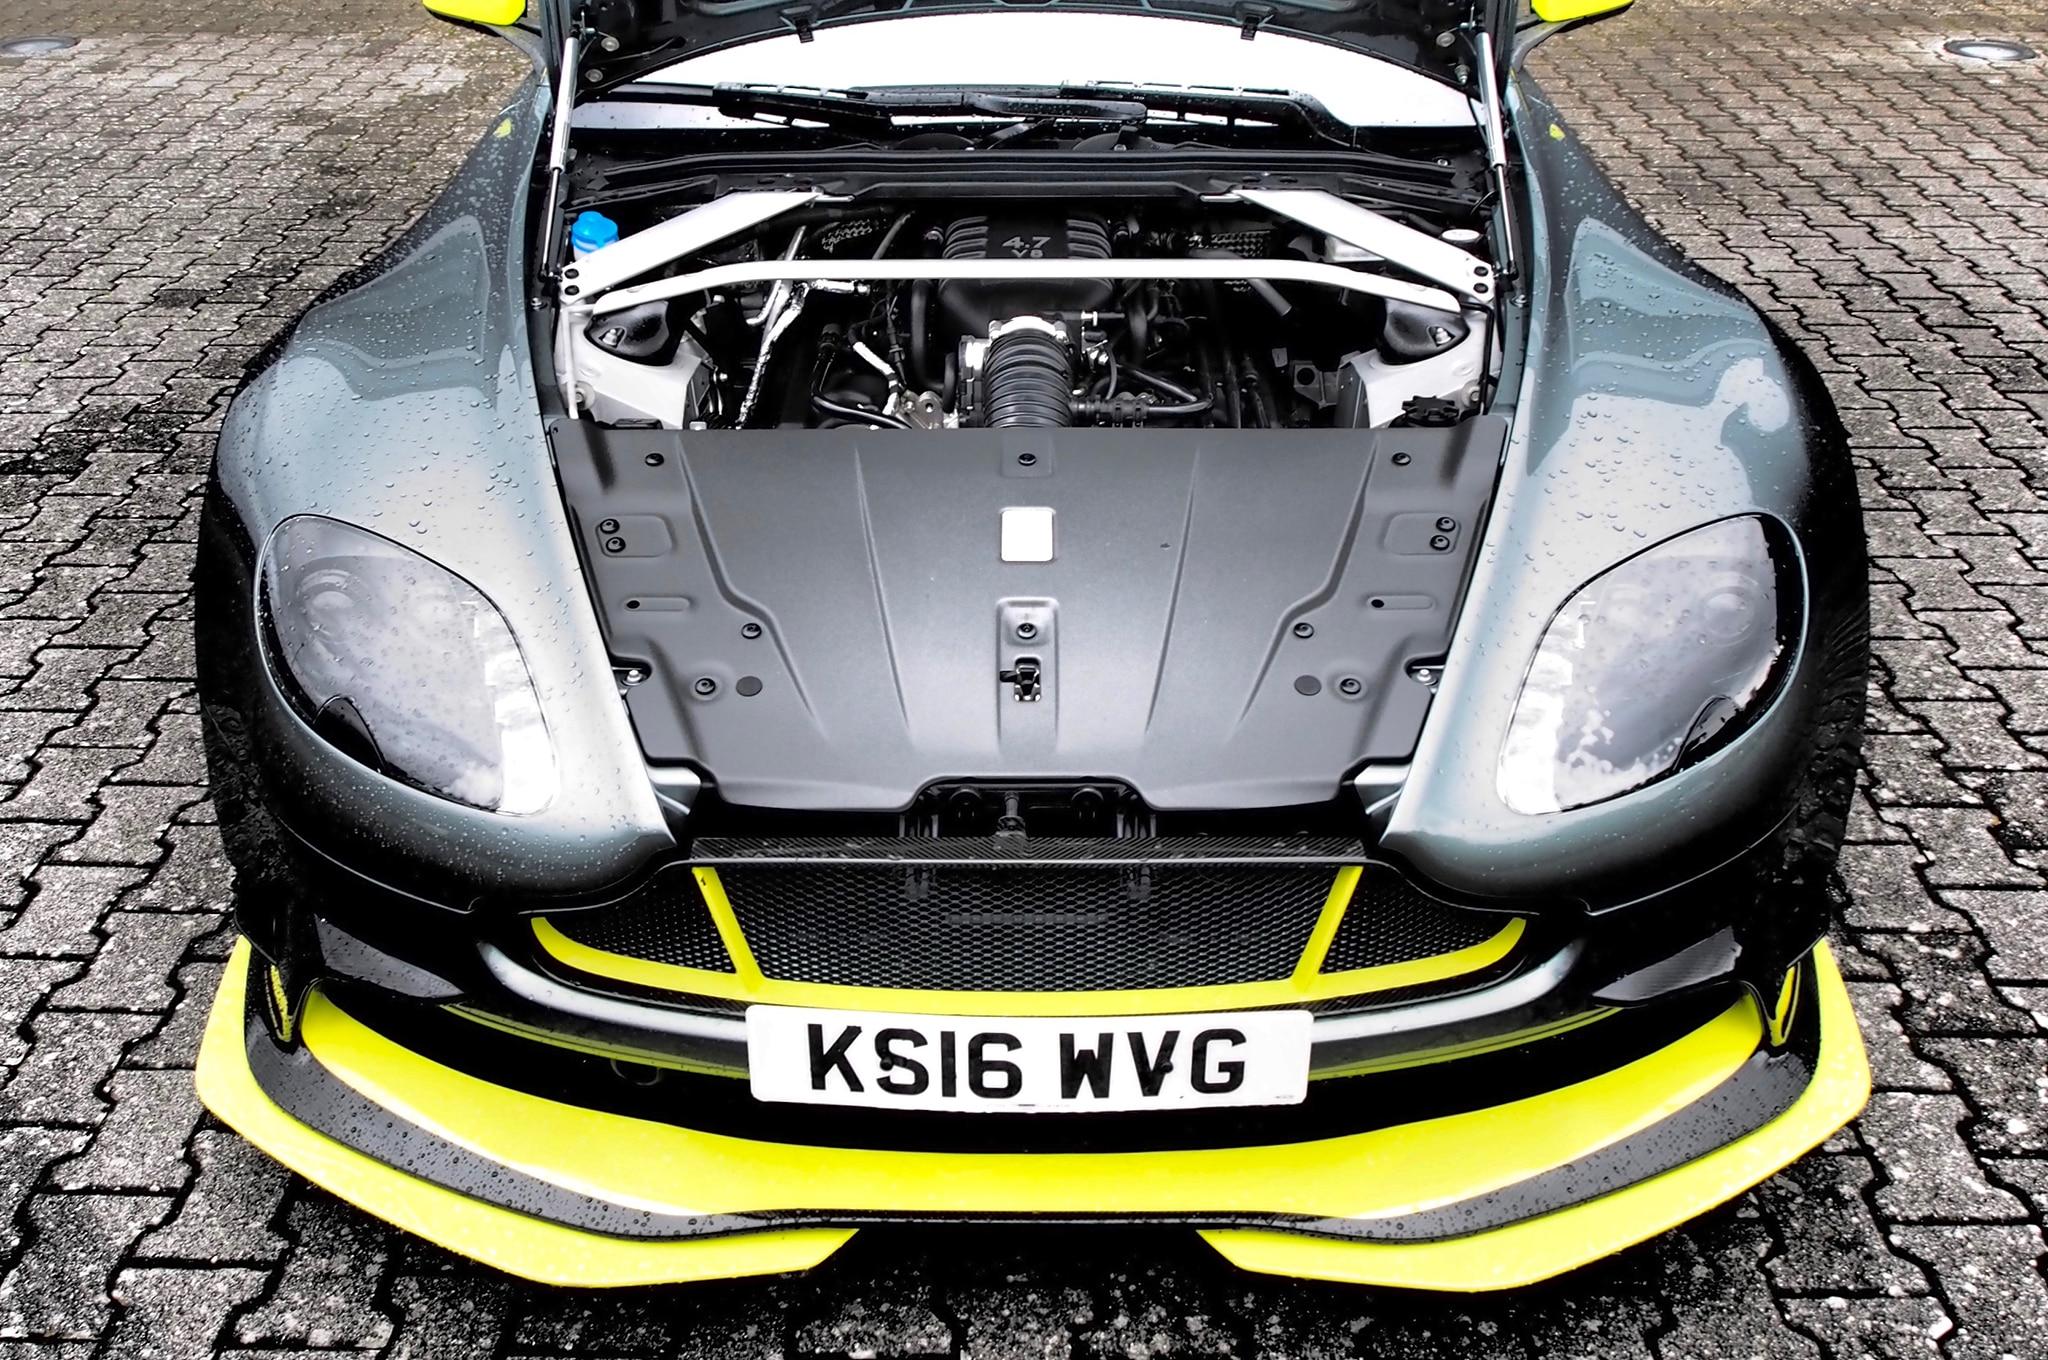 Aston Martin V8 Vantage Gt8 And V12 Vantage S Track Drive